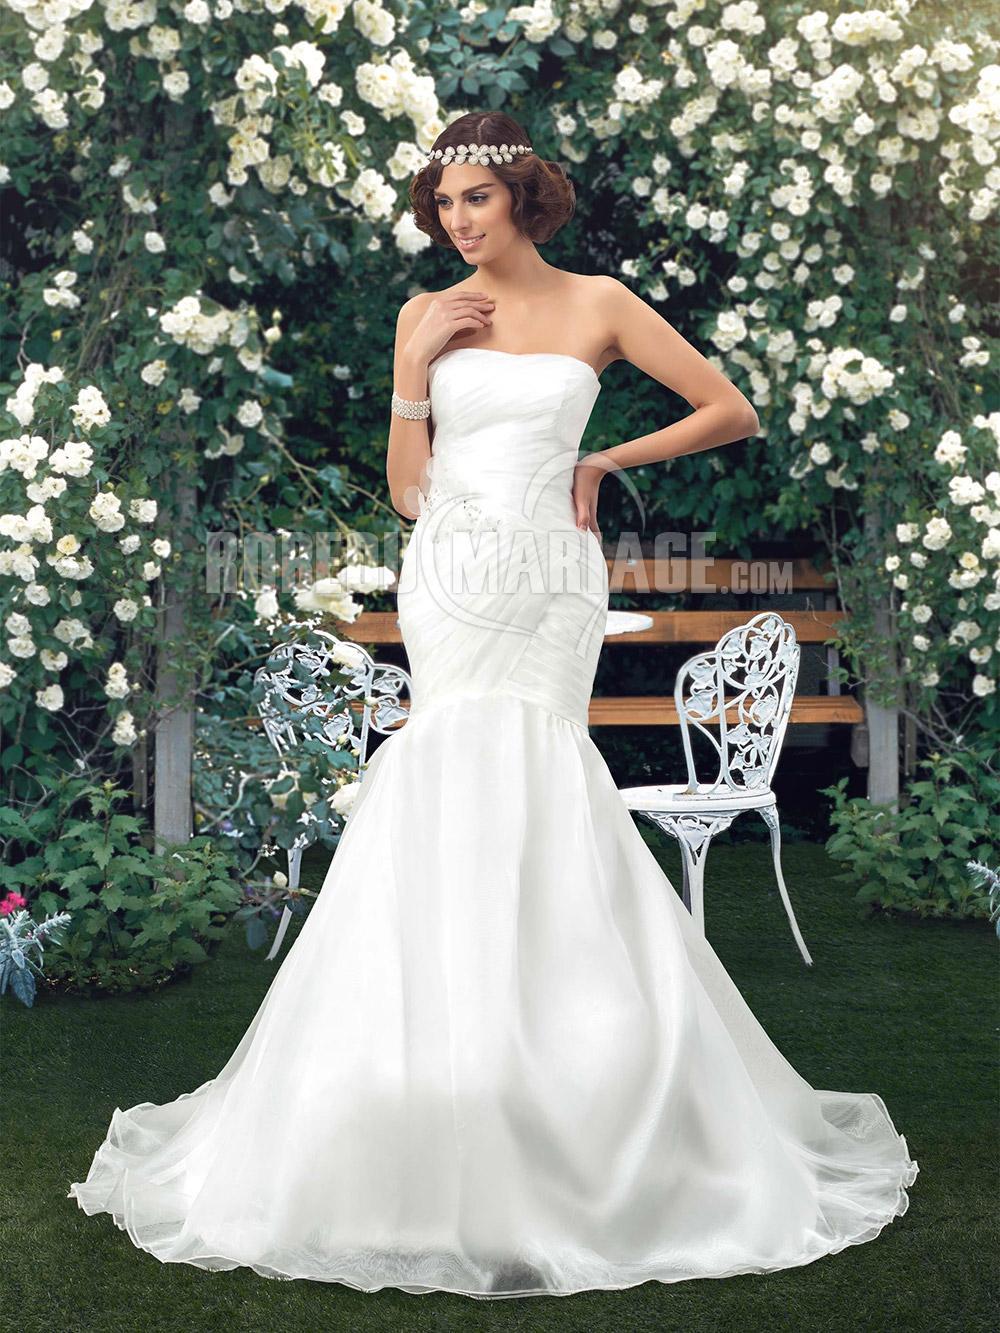 Accueil > Robe de mariage > Robe de mariée 2017 > Robe de mariée ...